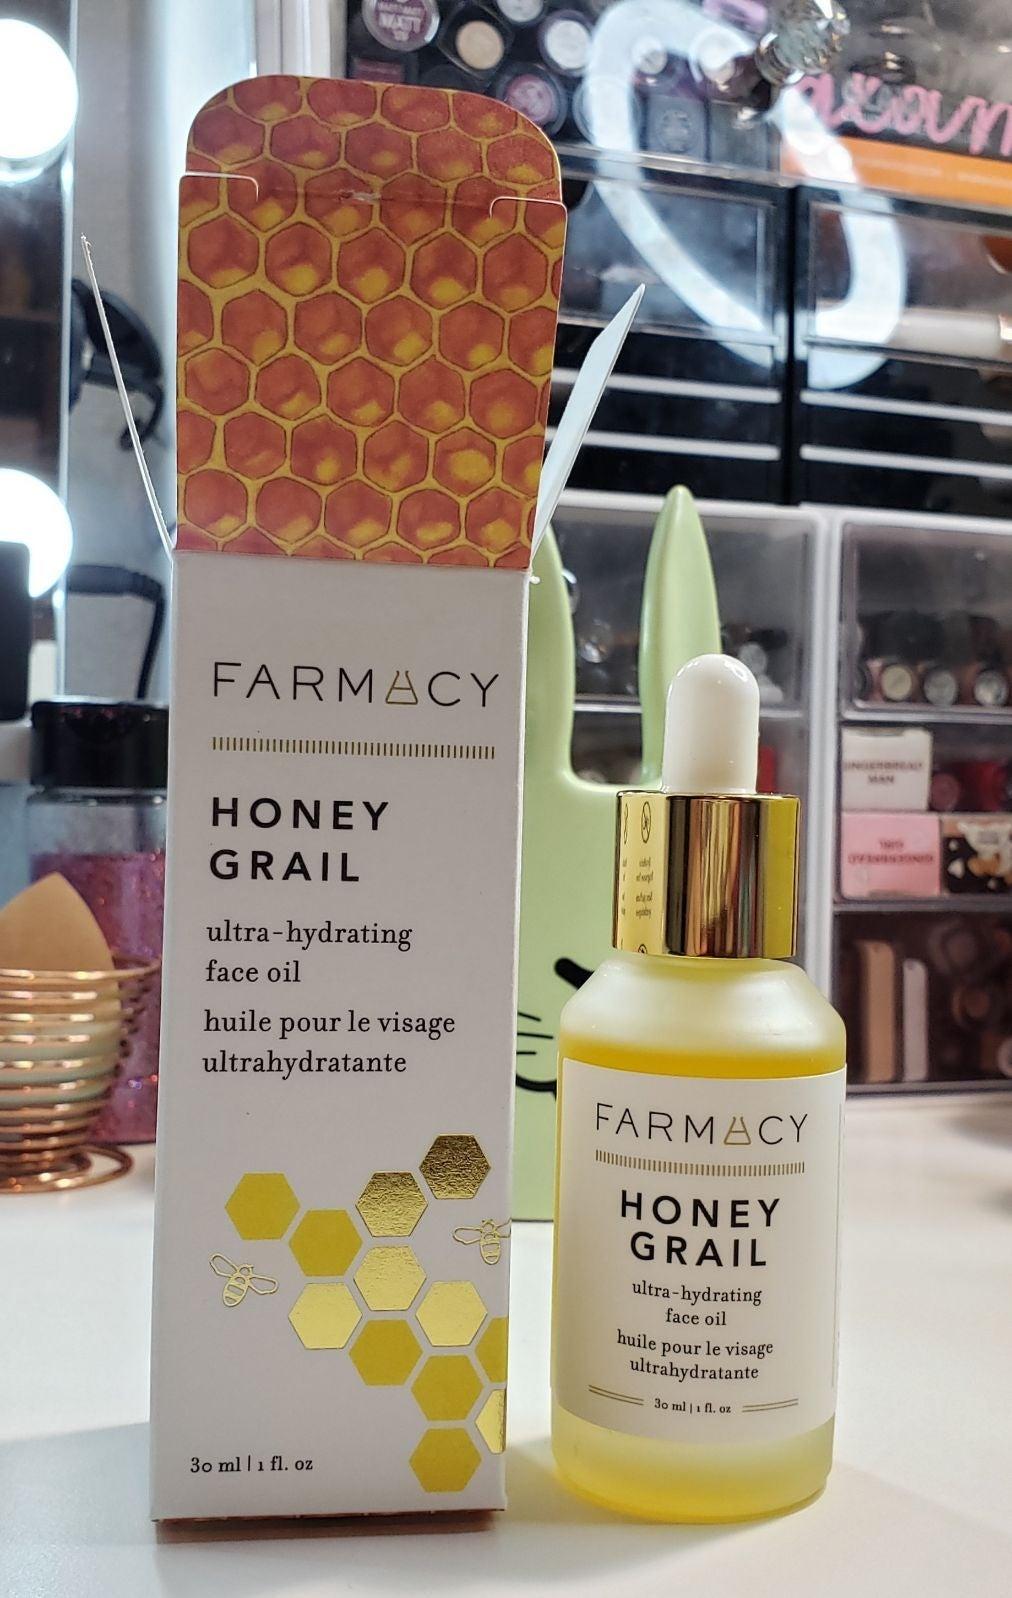 Farmacy Honey Grail Face Oil